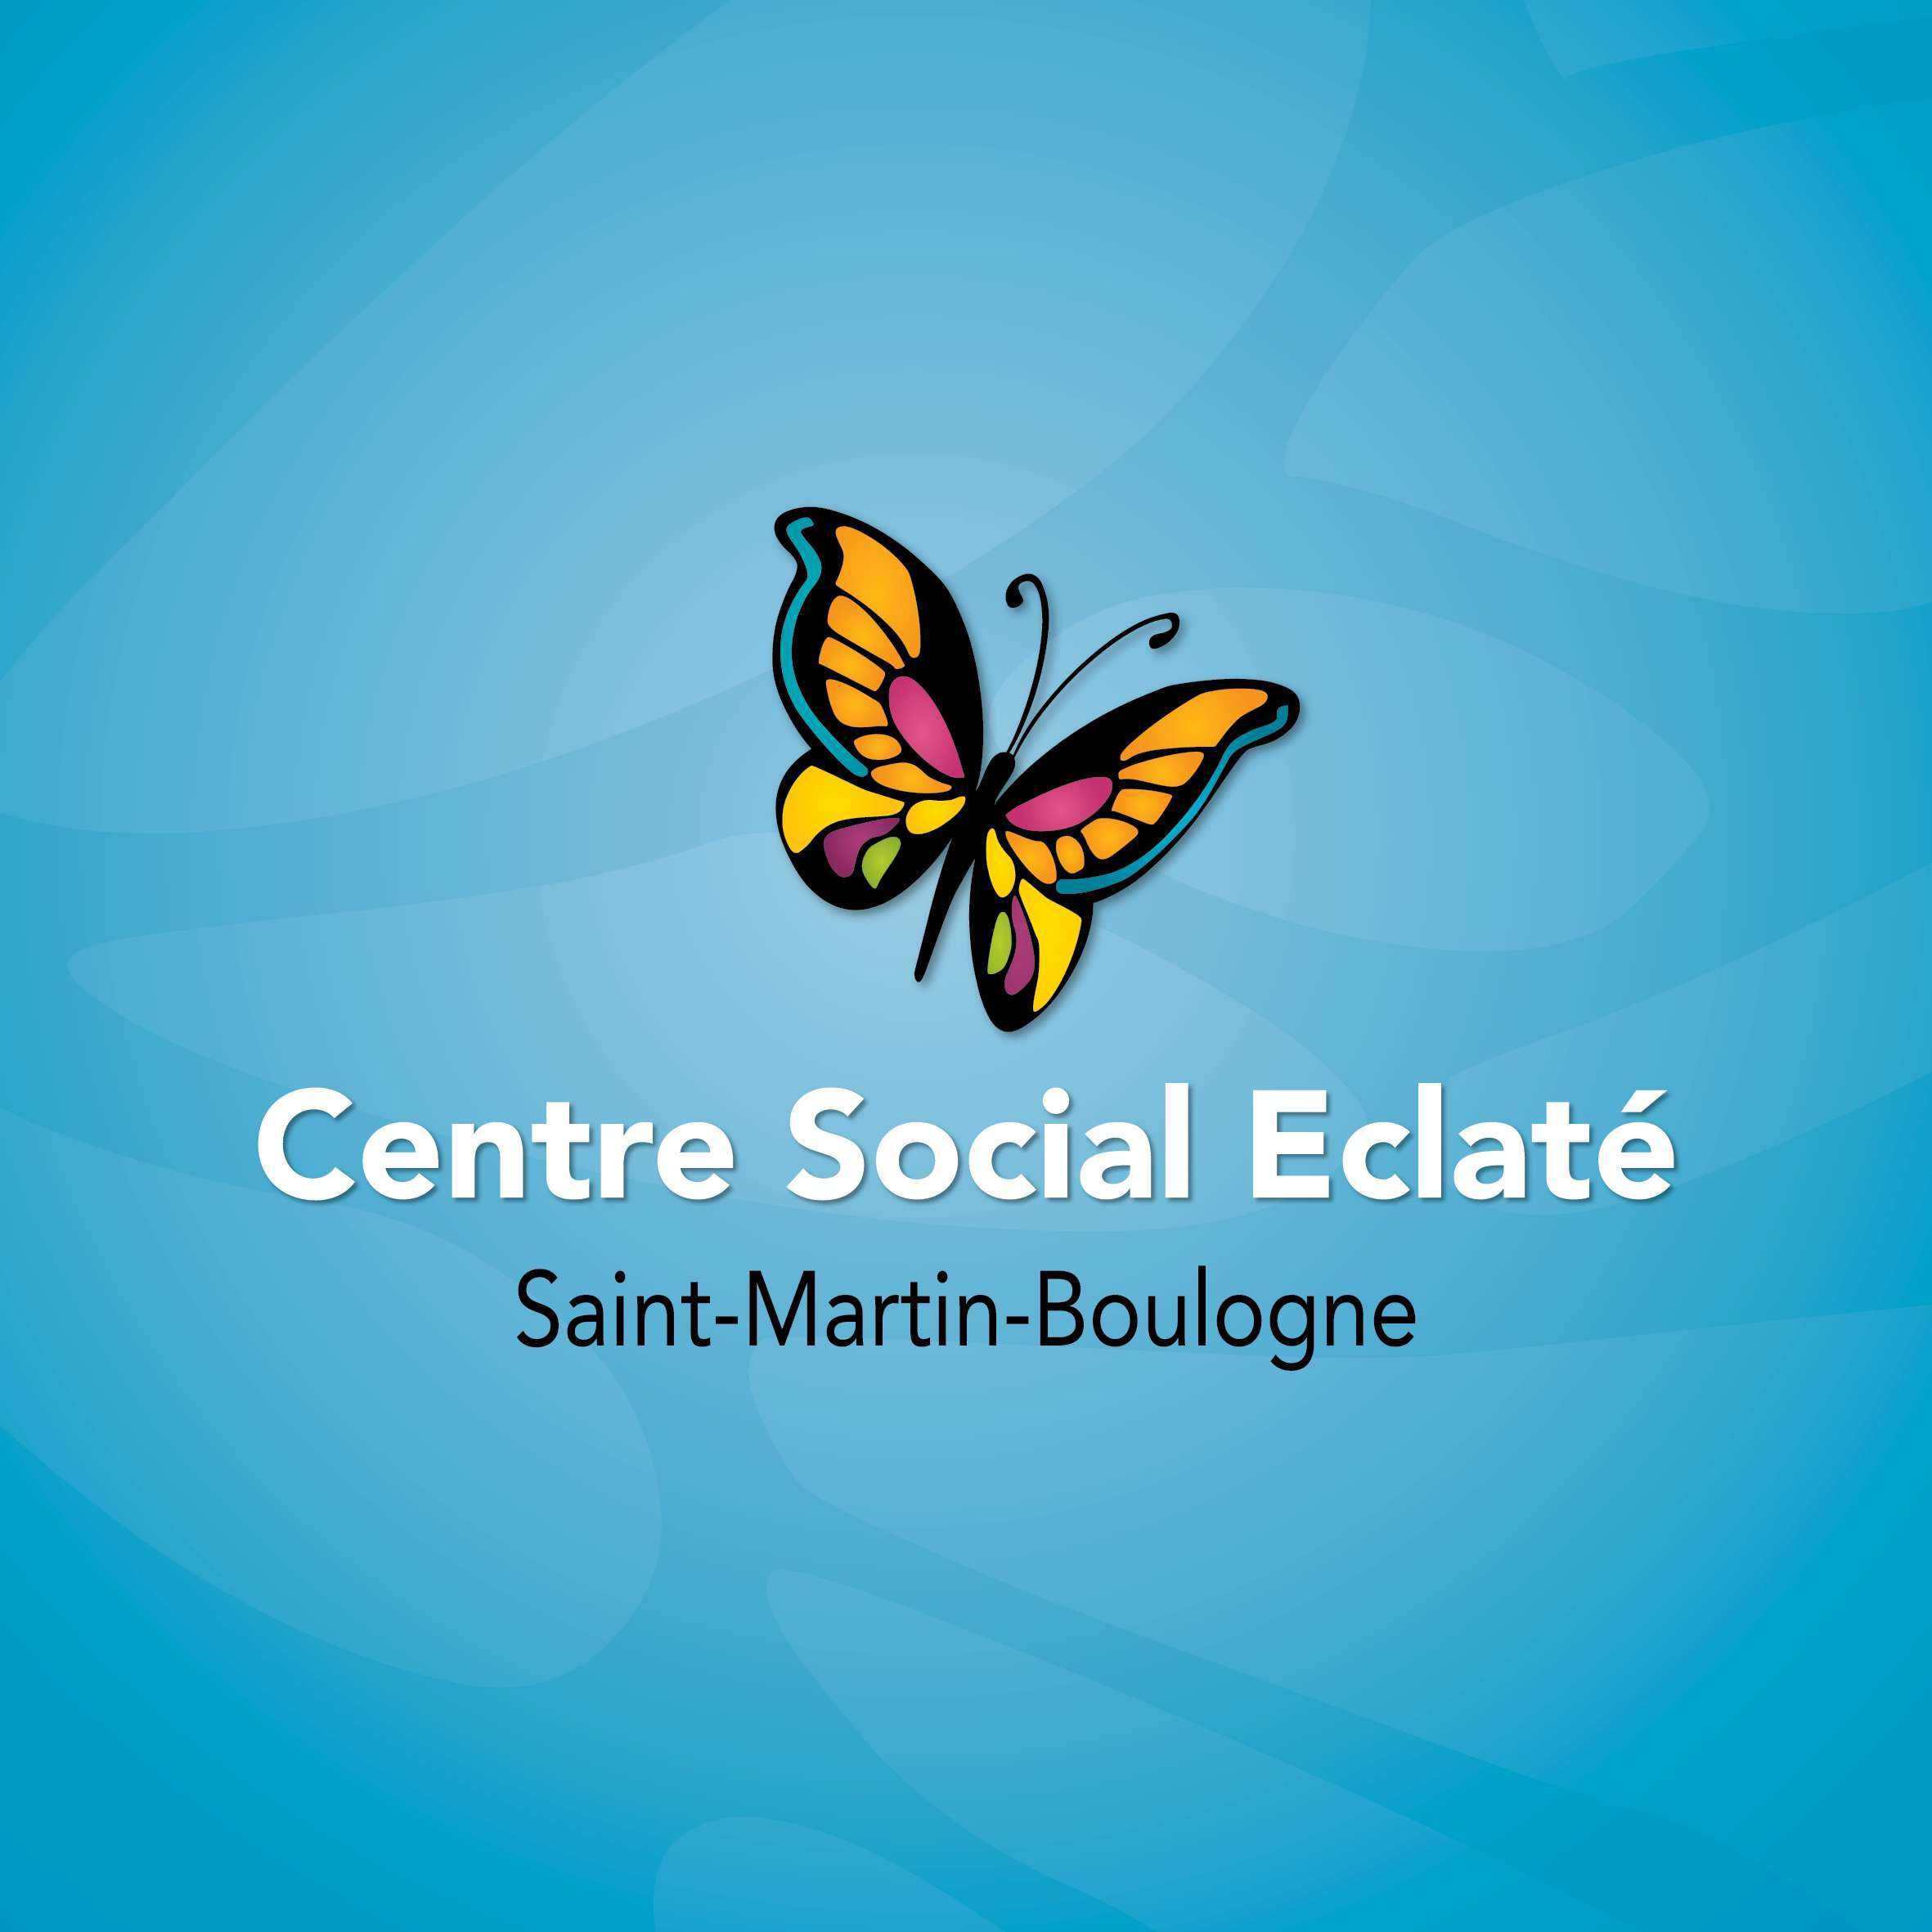 centresocialeclate.centres-sociaux.fr/files/2016/01/saint-martin-boulogne-centre-social-eclate-91